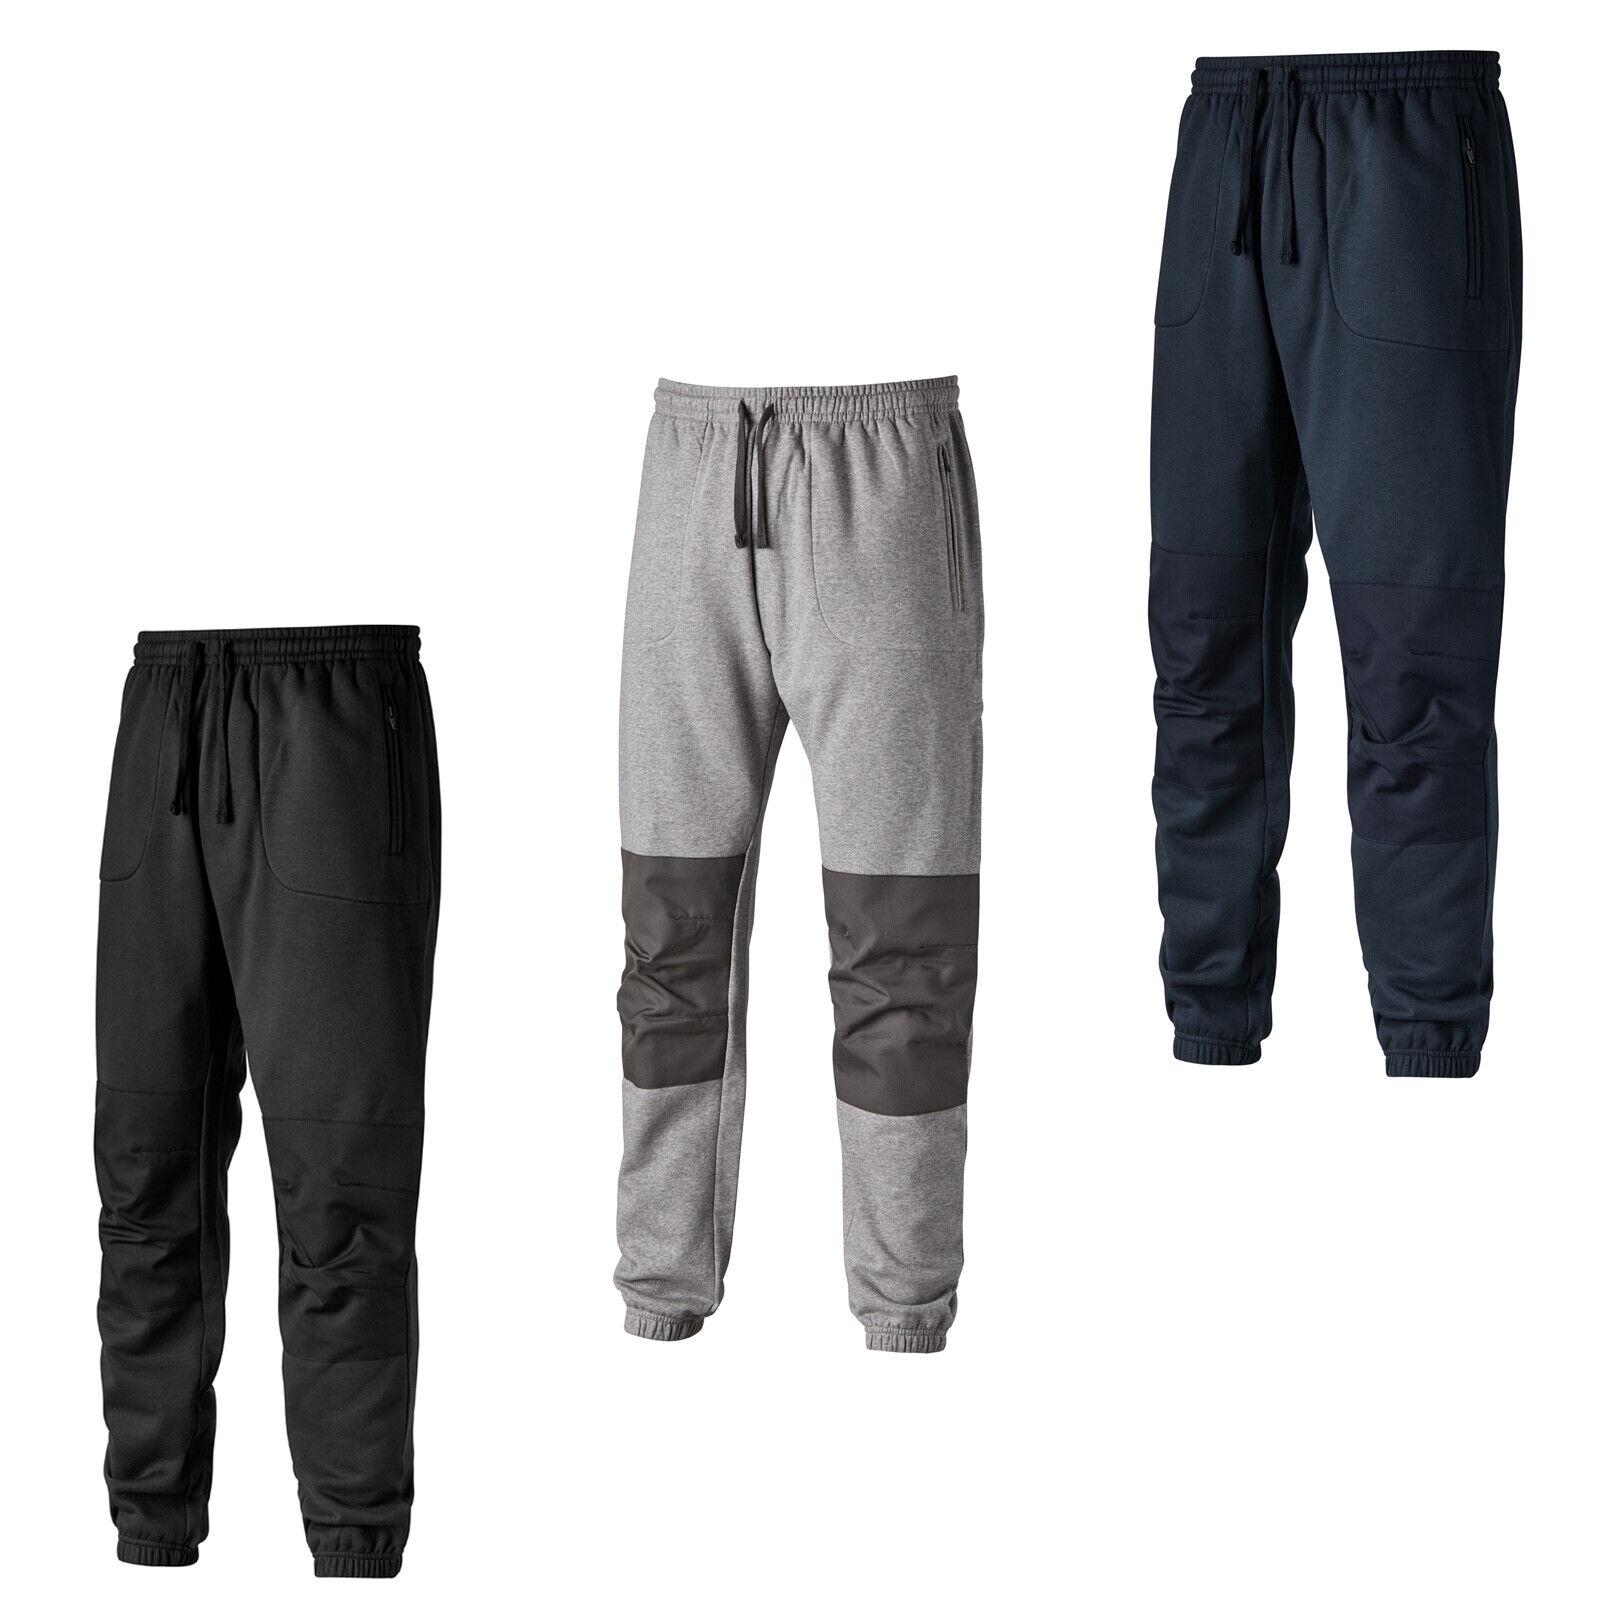 Dickies Elasticated Joggers Multi Pocket Warm Comfortable Zip Pockets TR2008